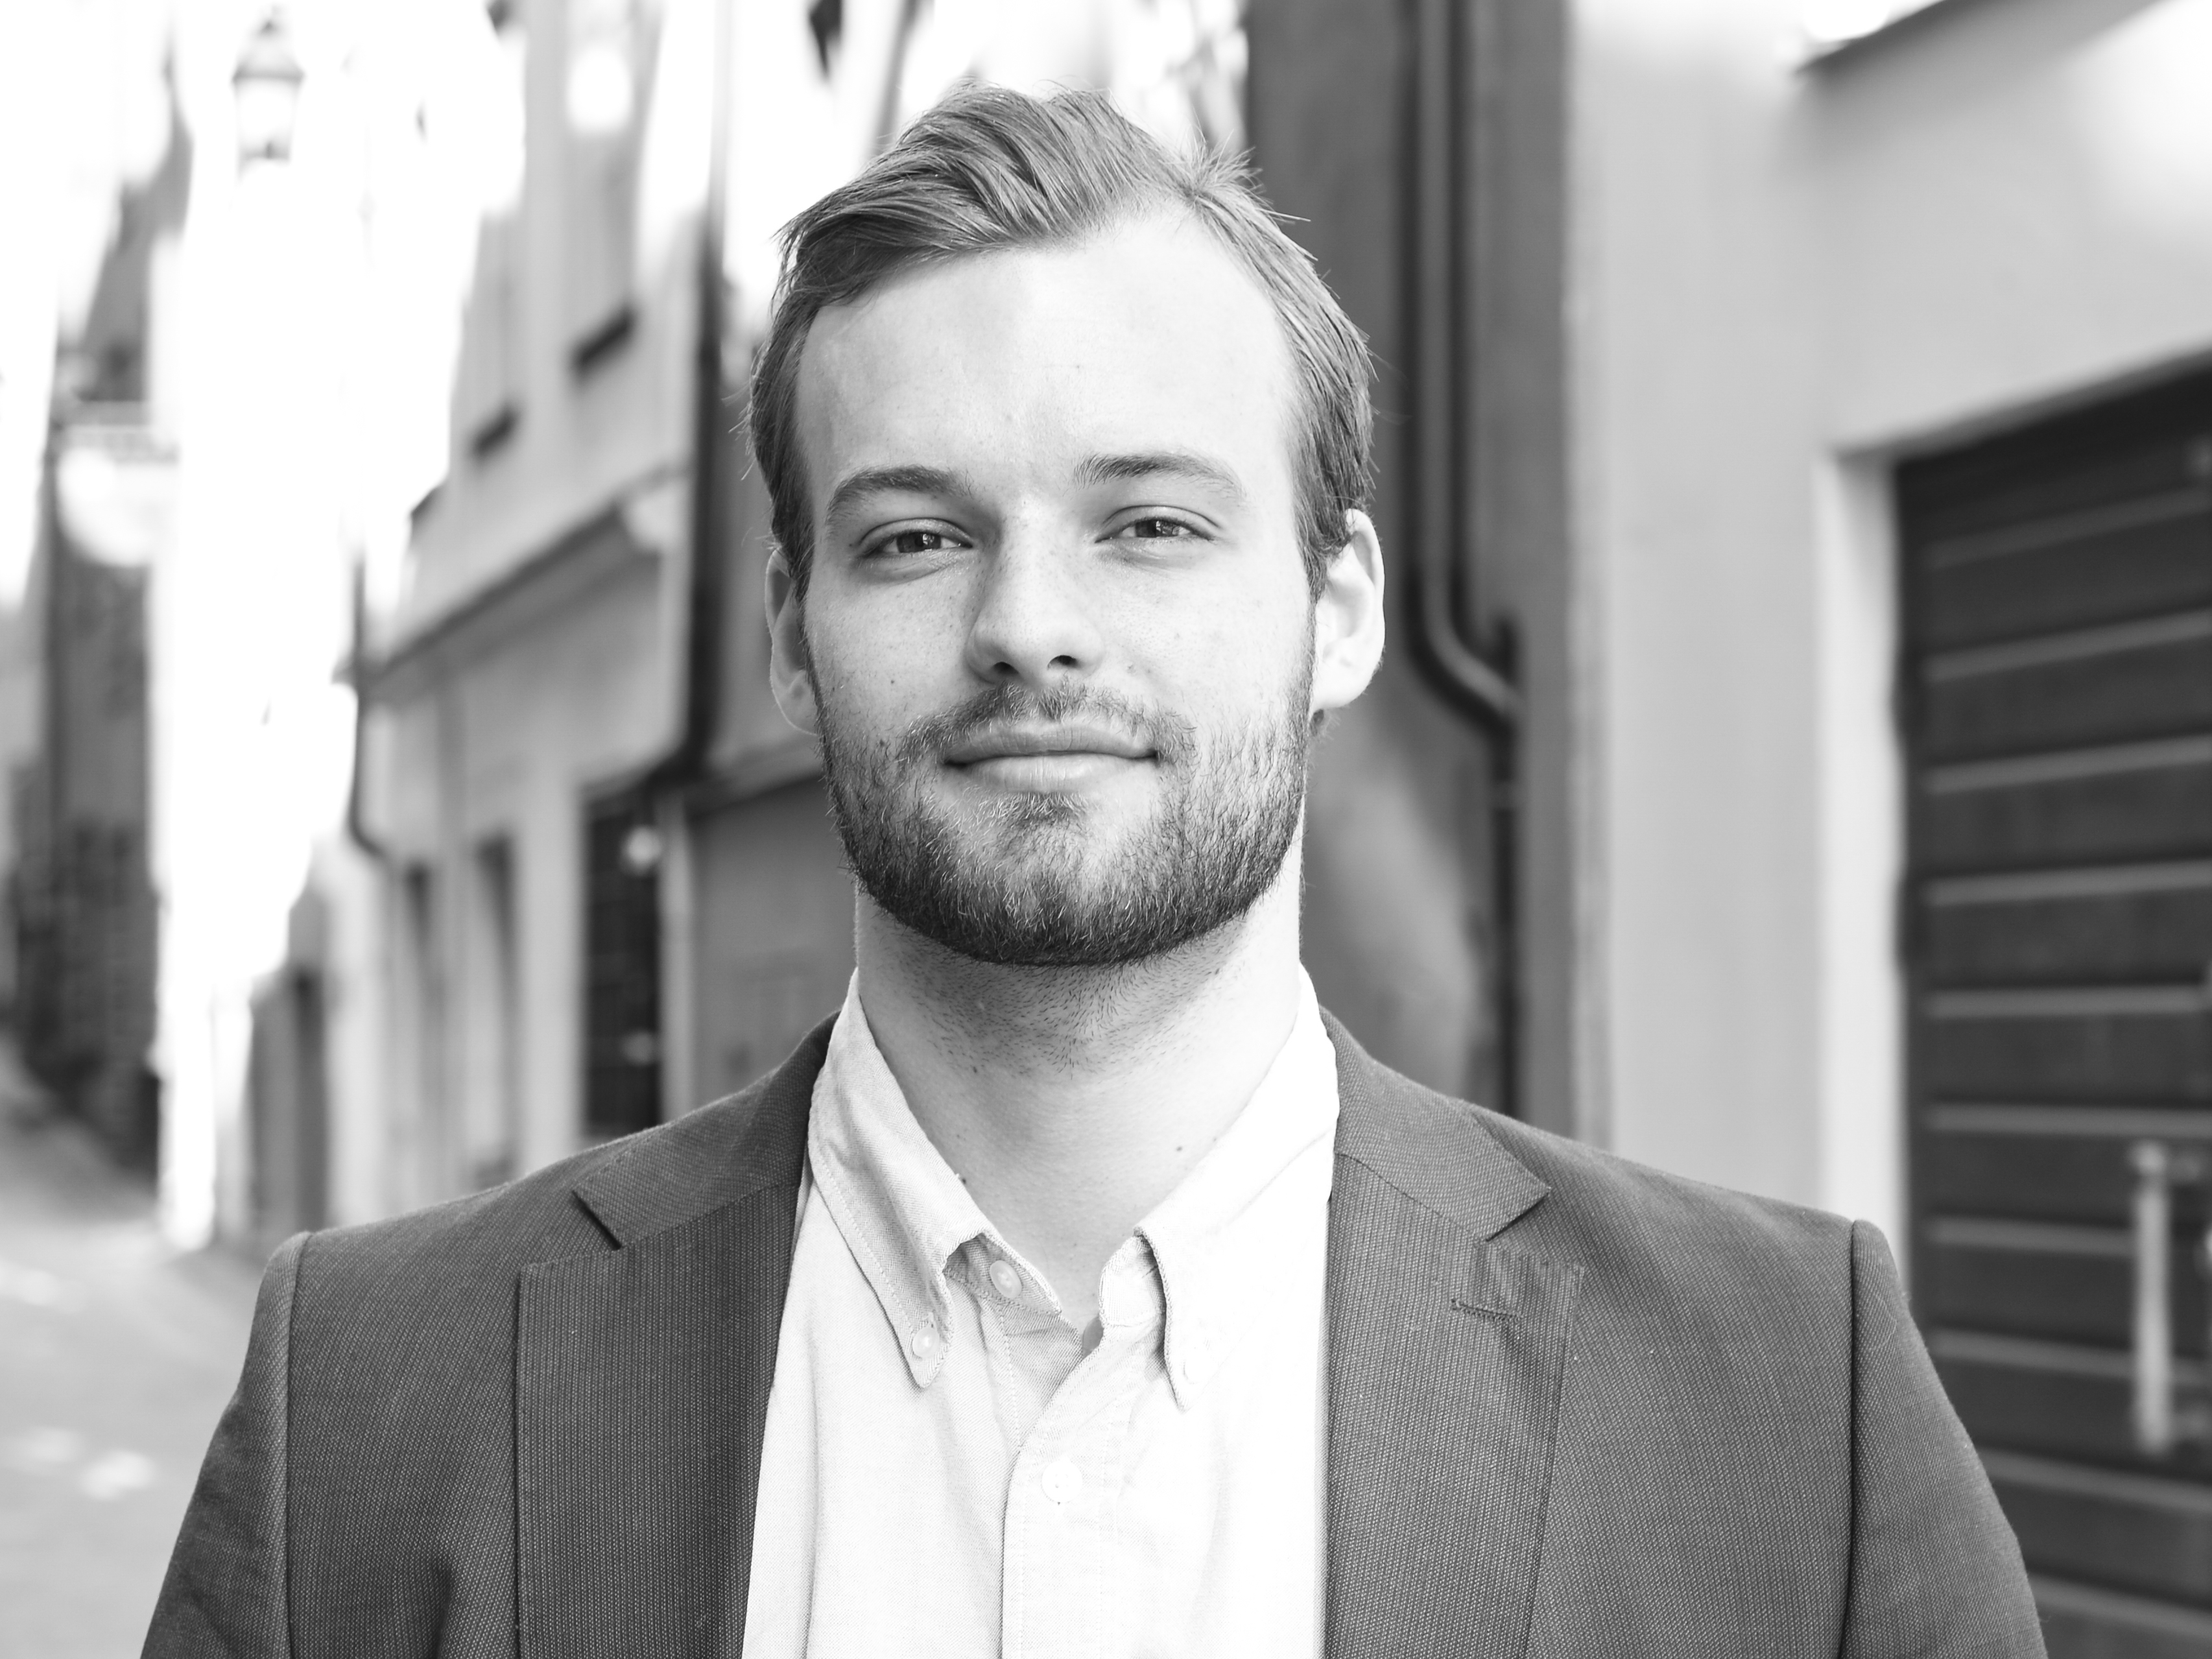 Mattias Söderqvist